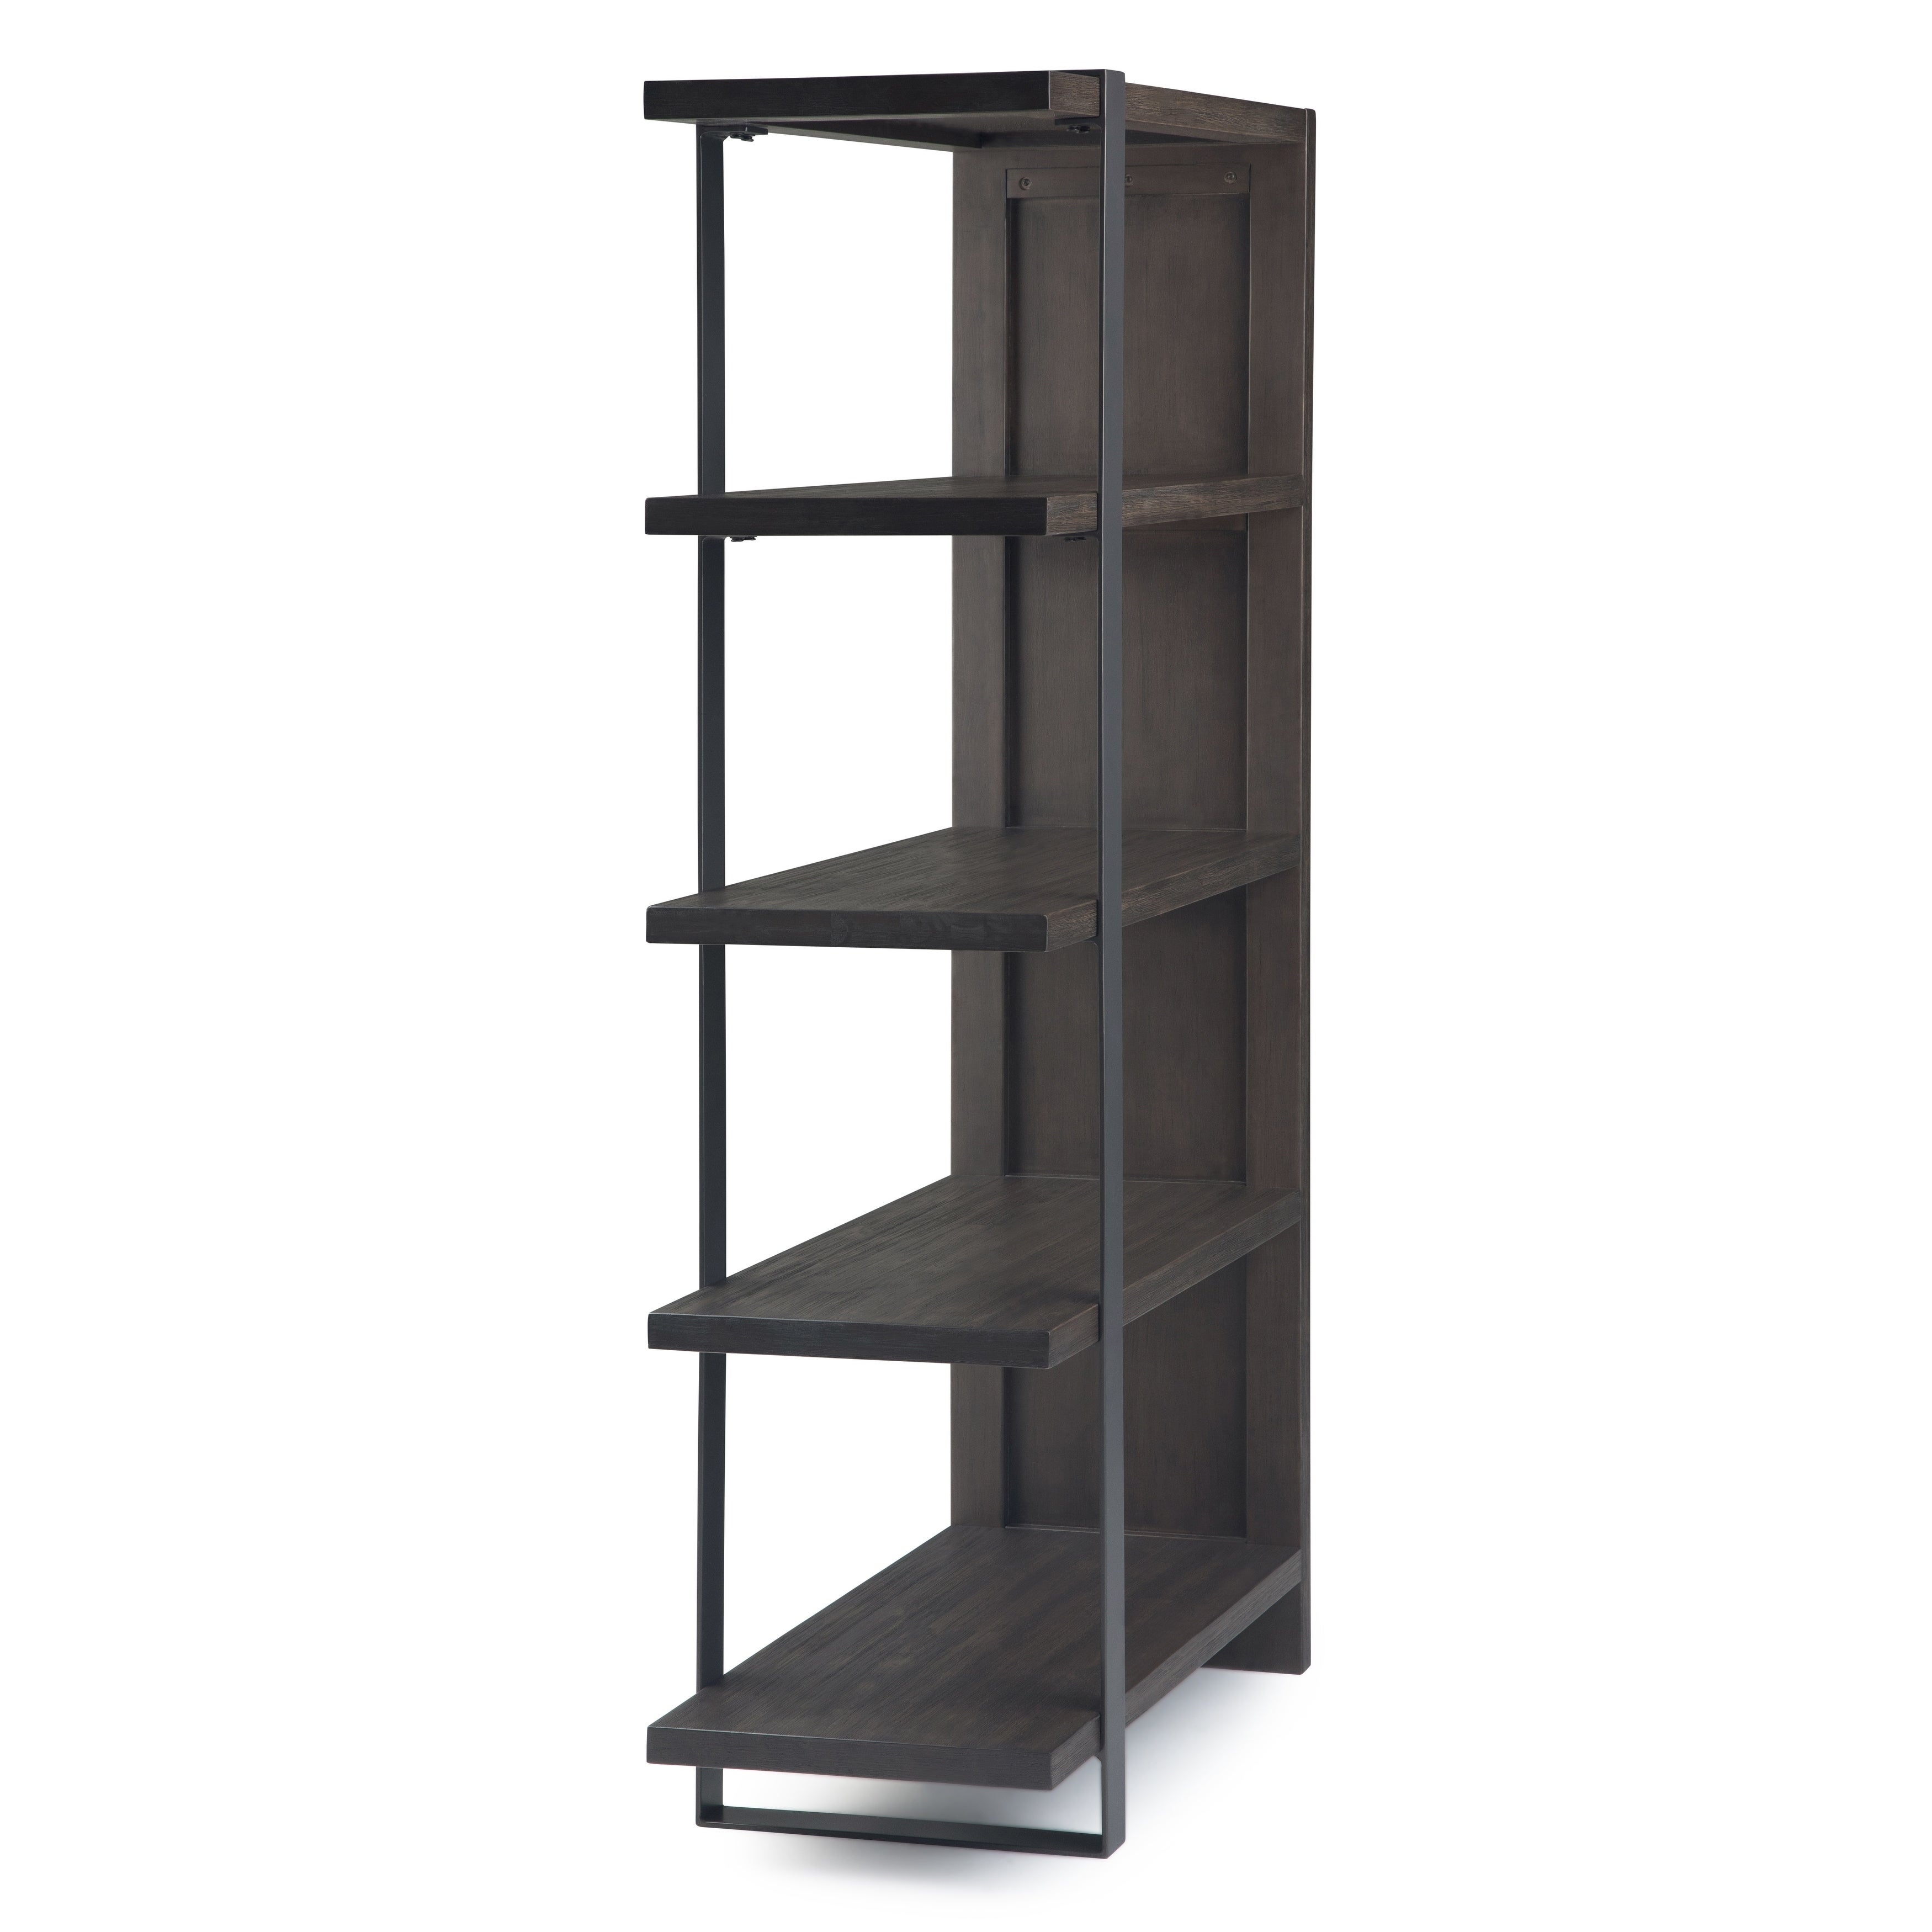 Carbon Loft Costa Industrial Bookcase In Distressed Dark Brown 36 W X 16 D X 66 H